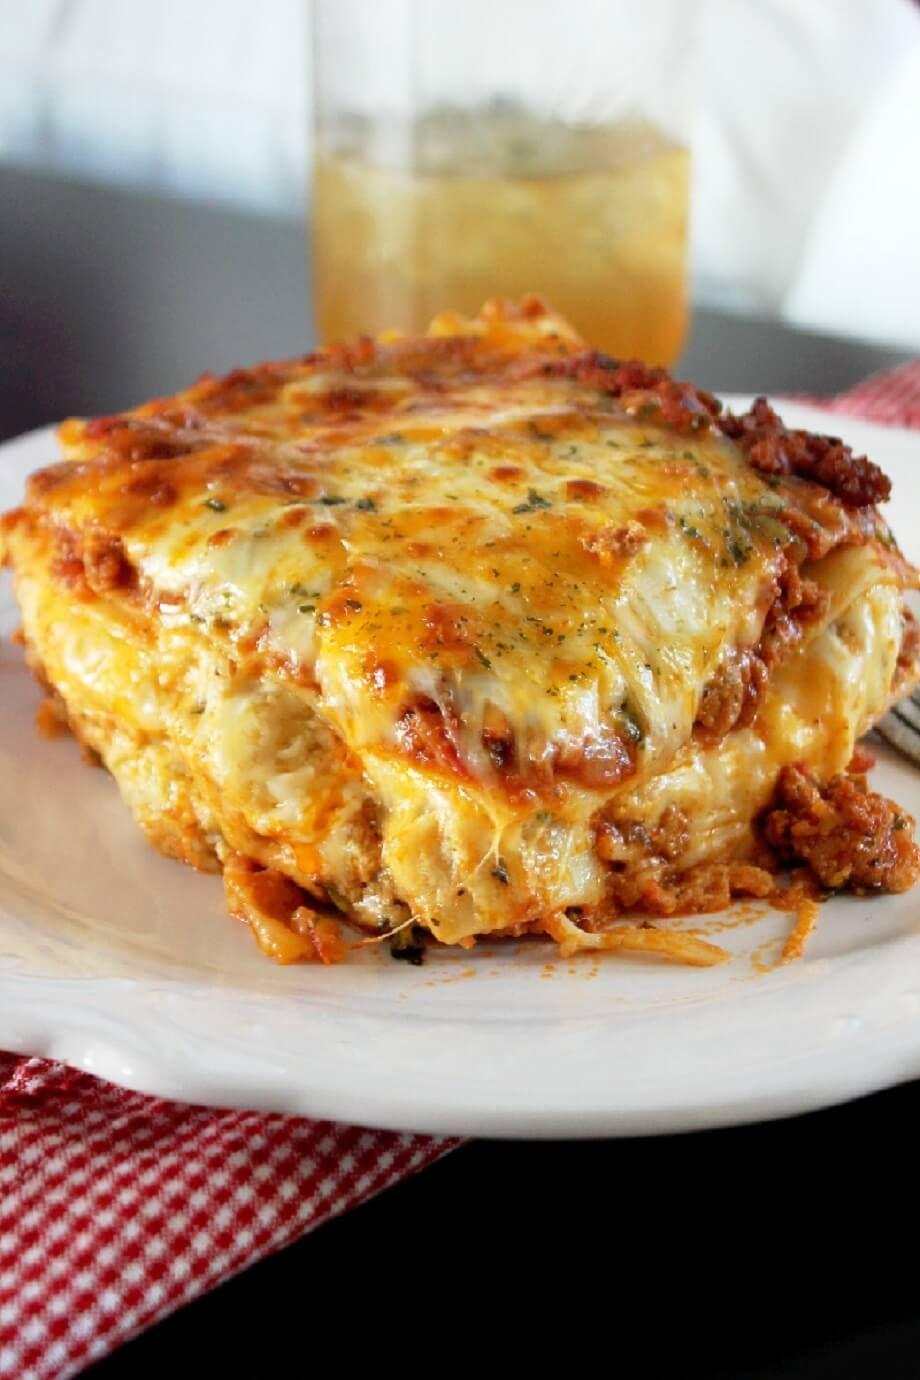 Cajun Dishes: Rustic And Delicious #cajundishes